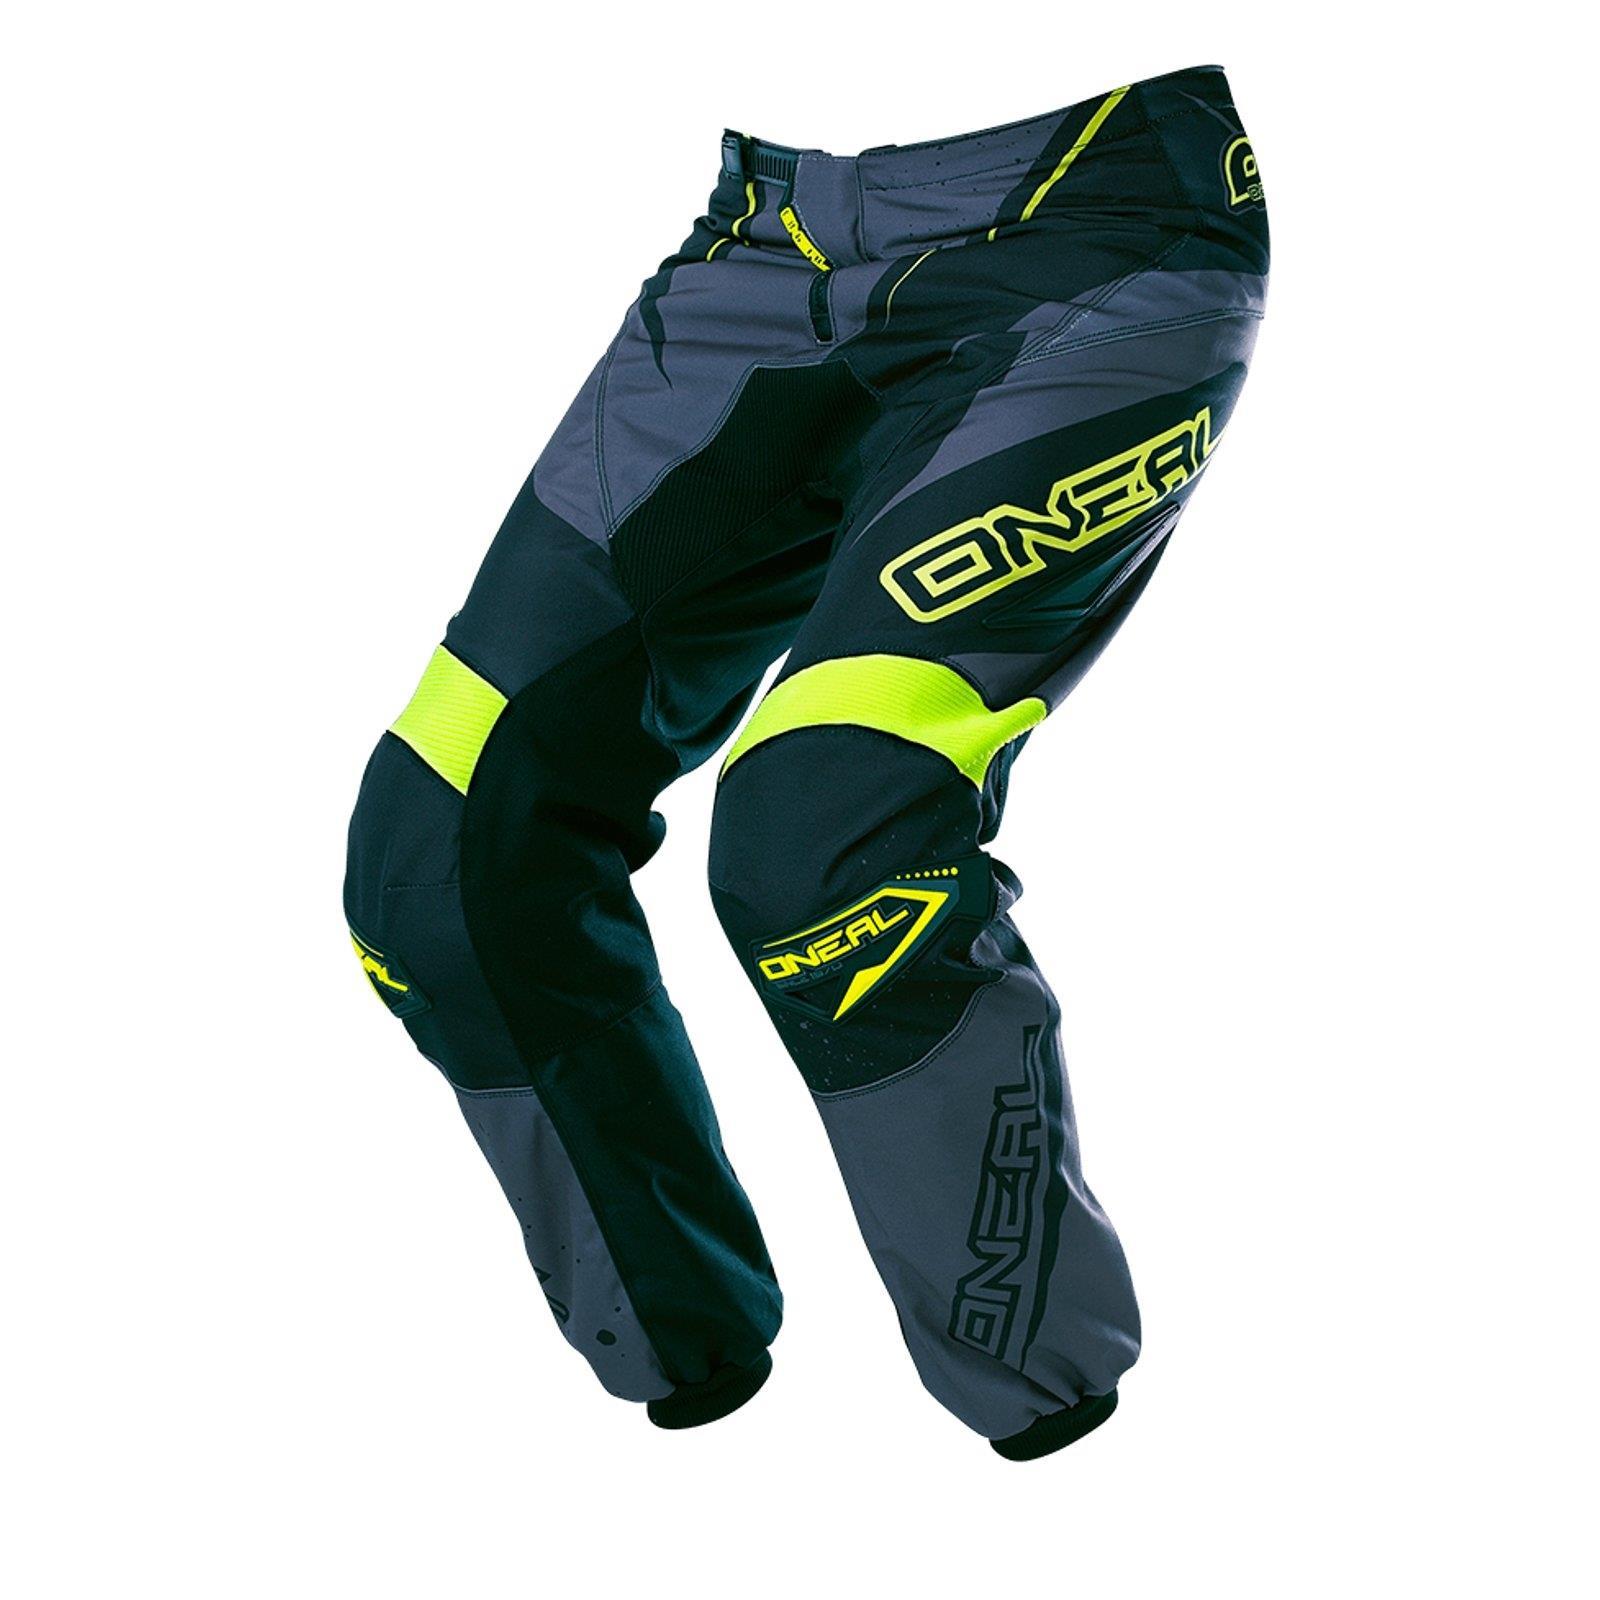 O-039-Neal-Element-MX-Pantaloni-Racewear-Pant-moto-cross-SX-Enduro-Fuoristrada-Moto-Quad miniatura 10